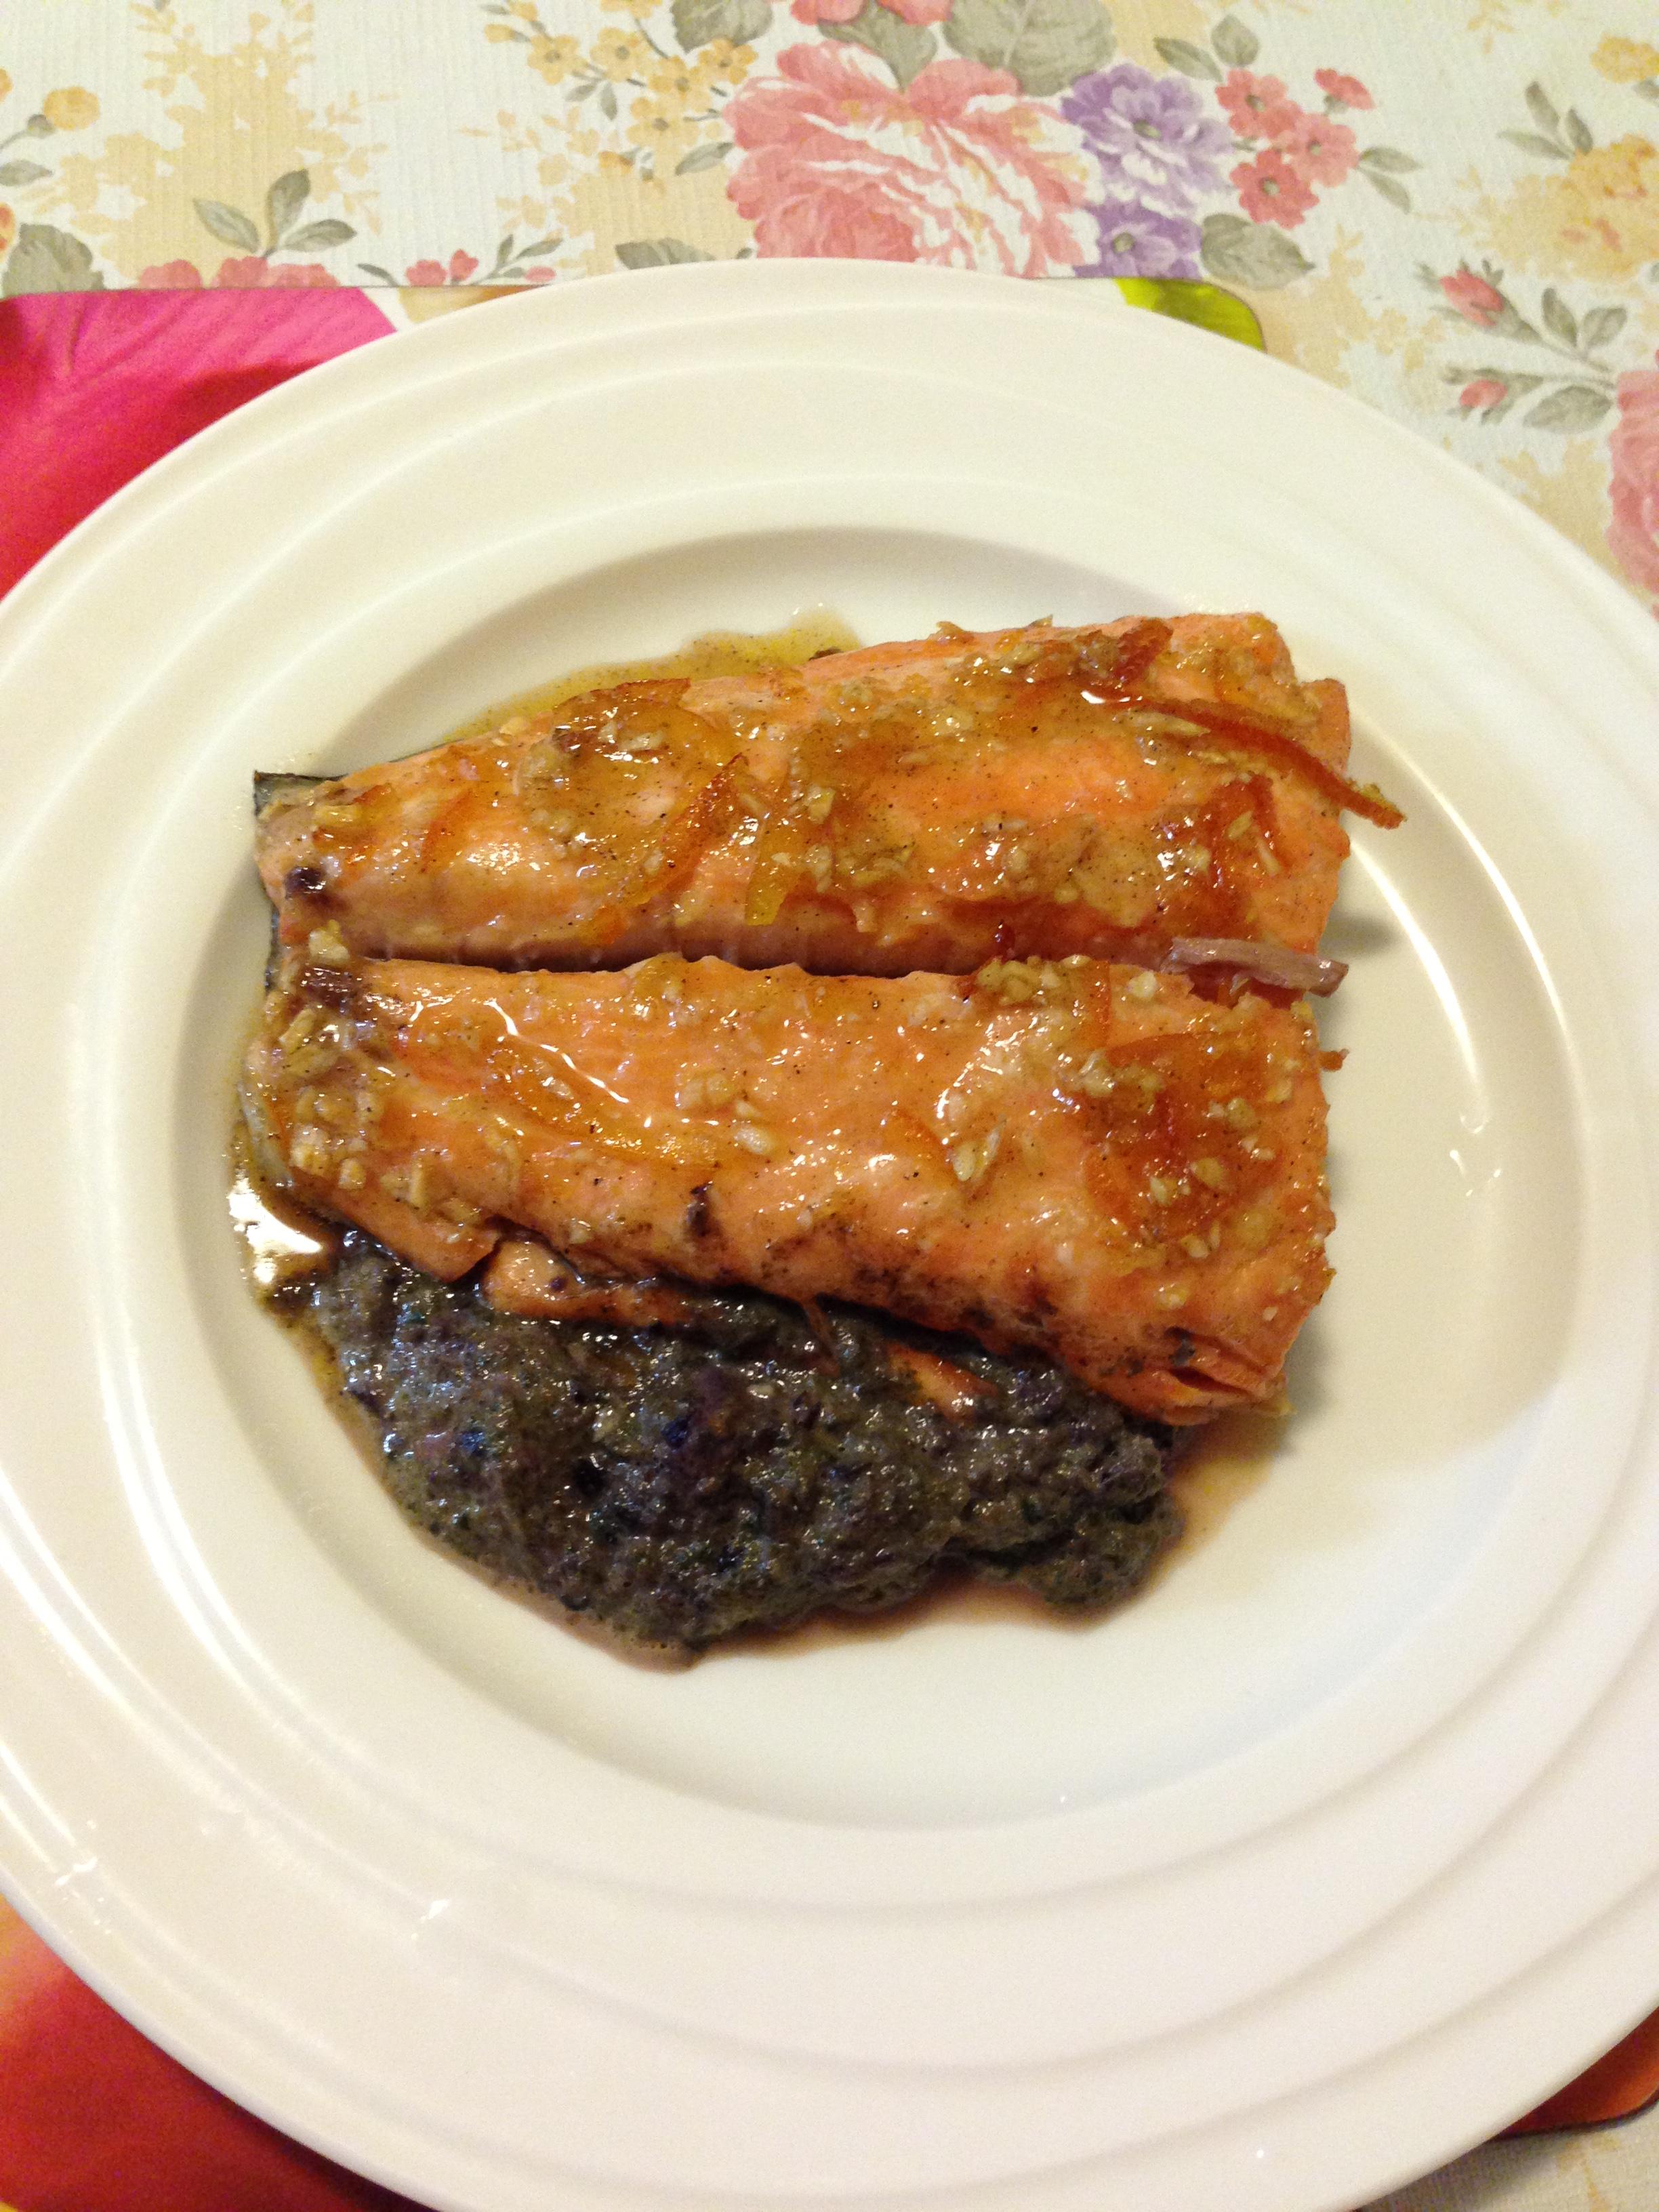 Roasted salmon w marmalade marinde.jpg